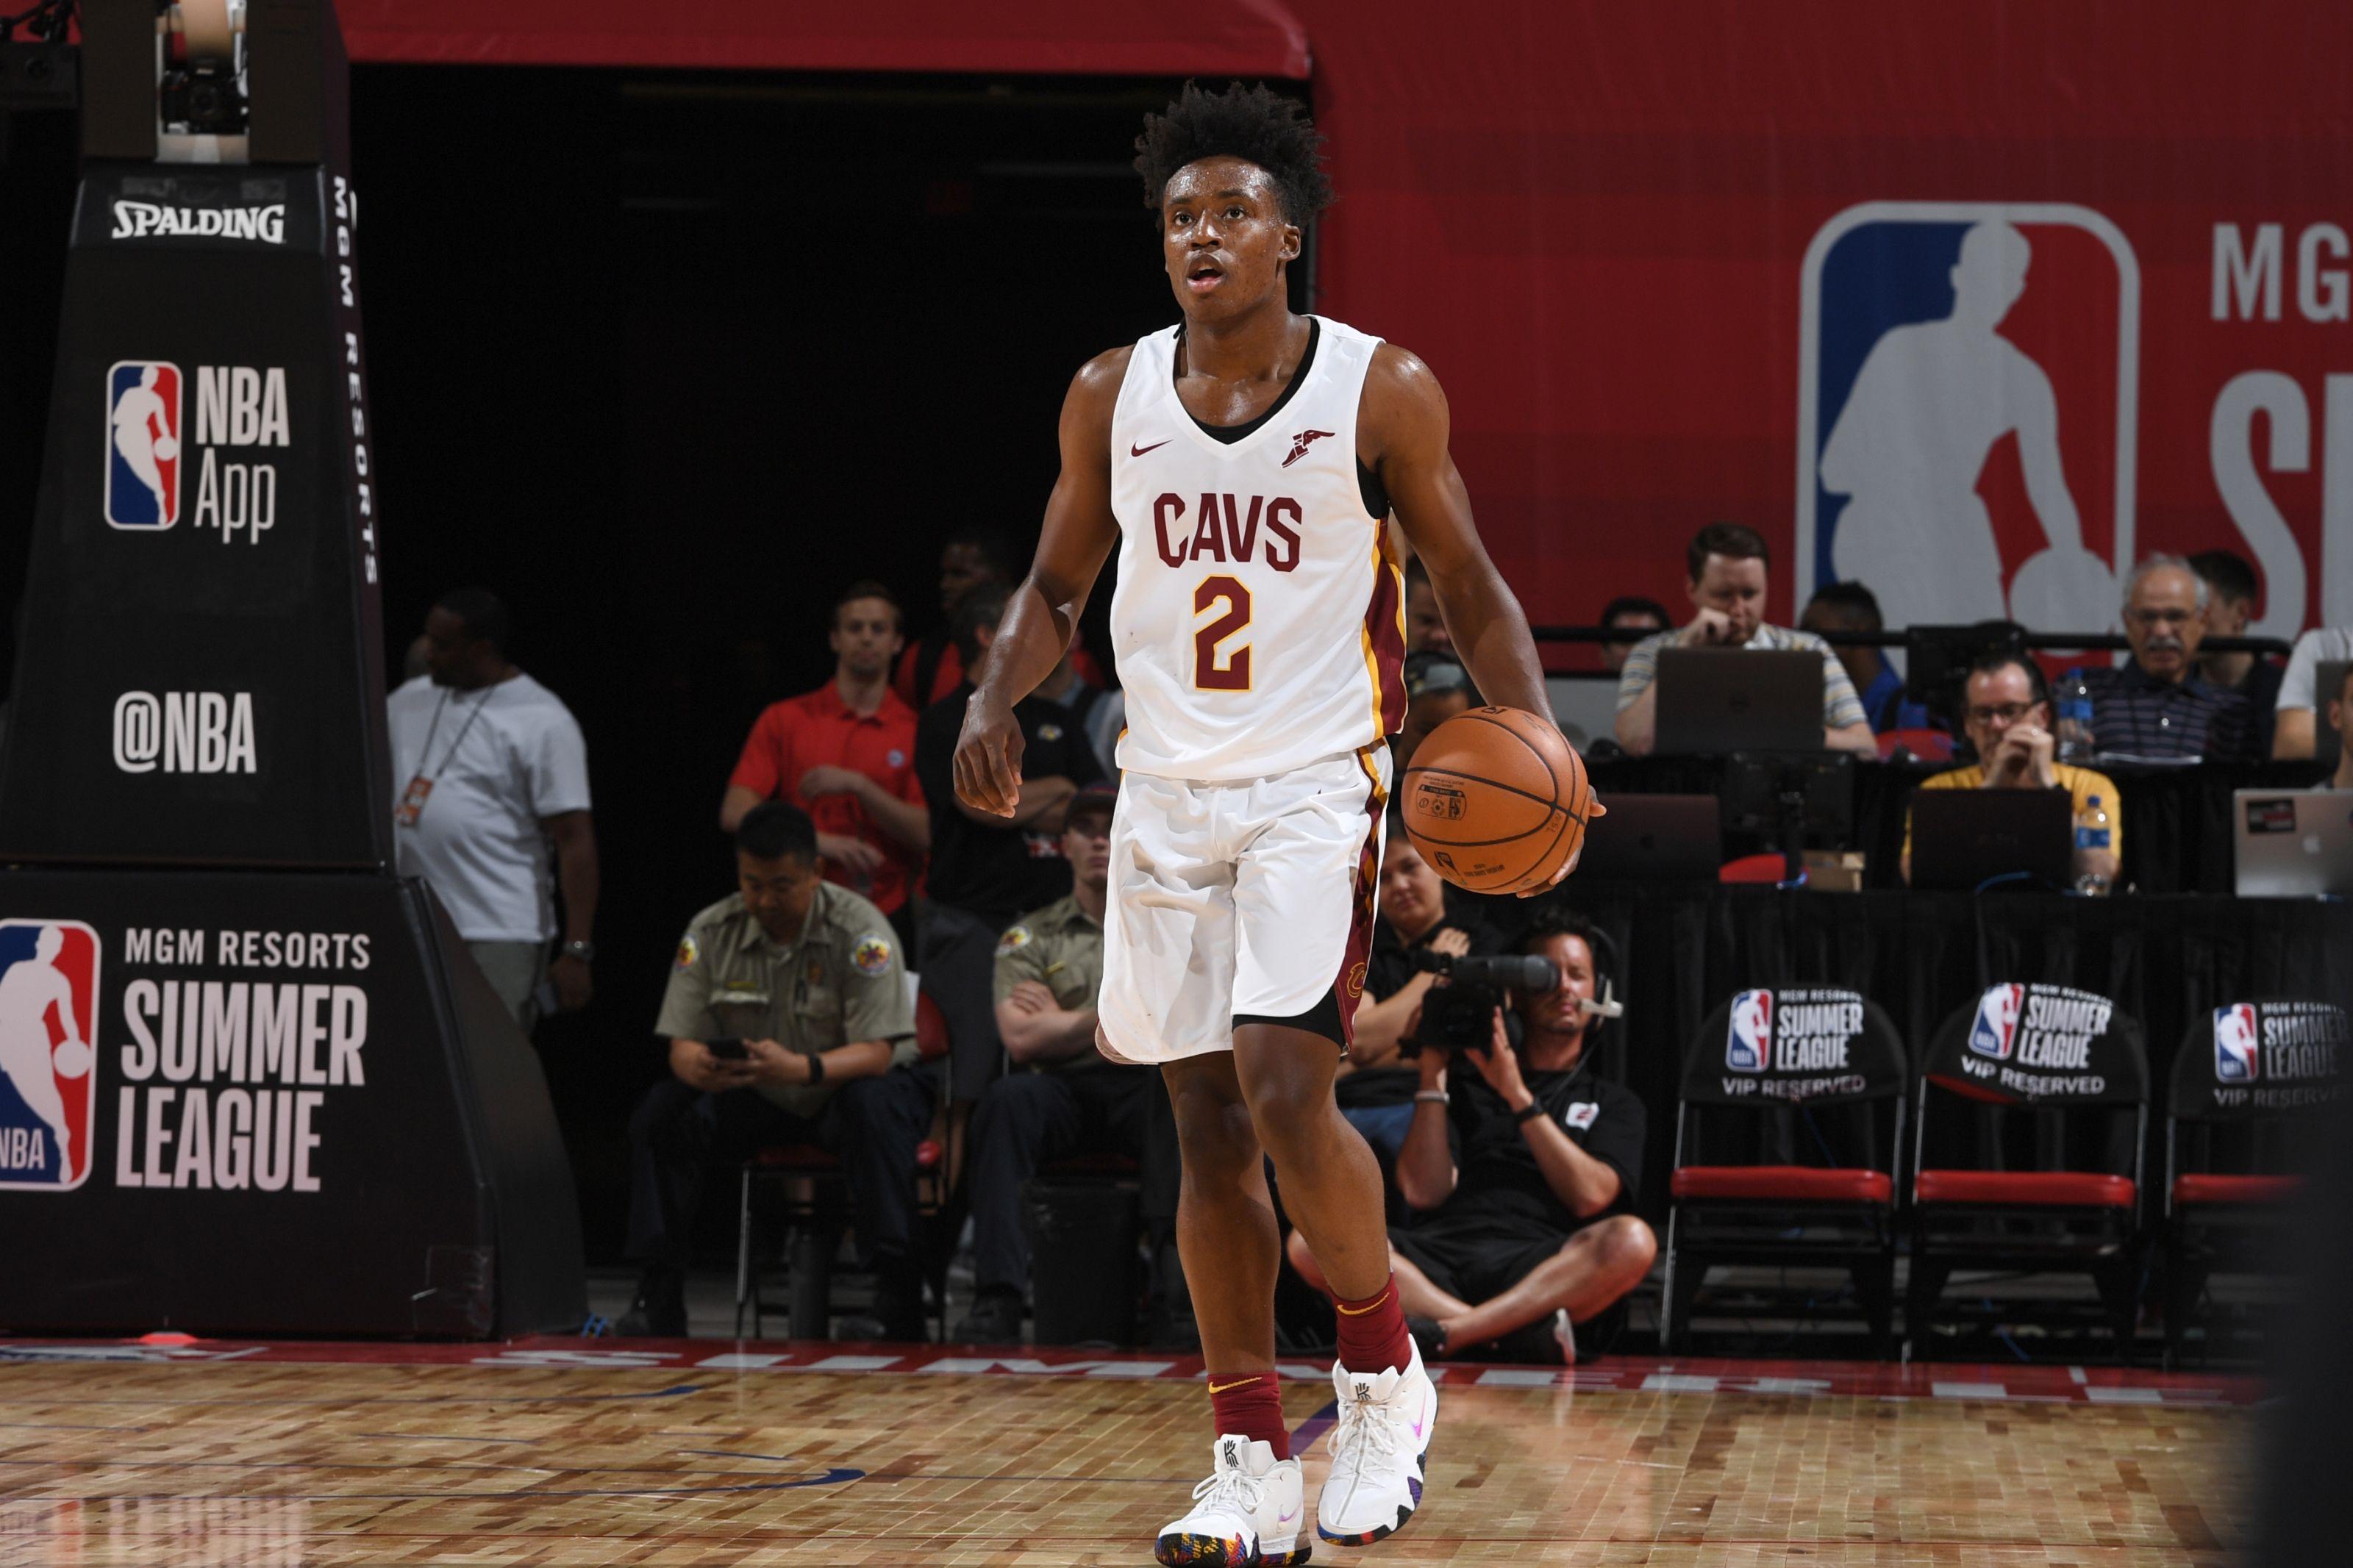 2018 NBA Summer League - Las Vegas - Chicago Bulls v Cleveland Cavaliers